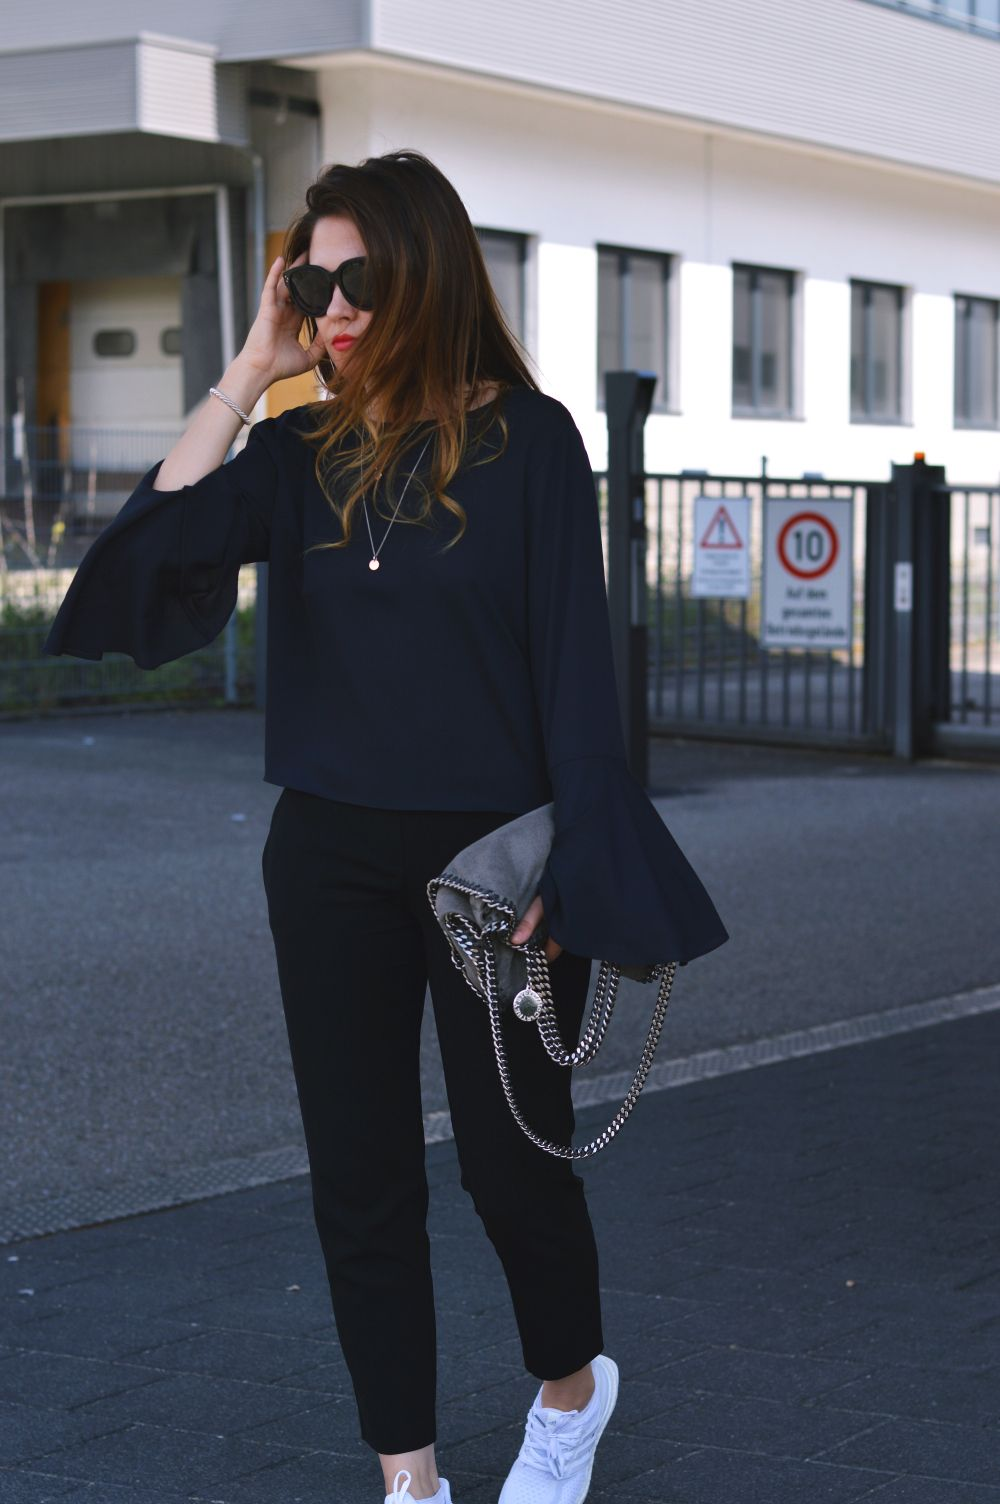 21575aca4  Adidas  UltraBoost  TripleWhite  StellaMcCartney  Falabella  Sleeves  Ultraboost Outfit Women